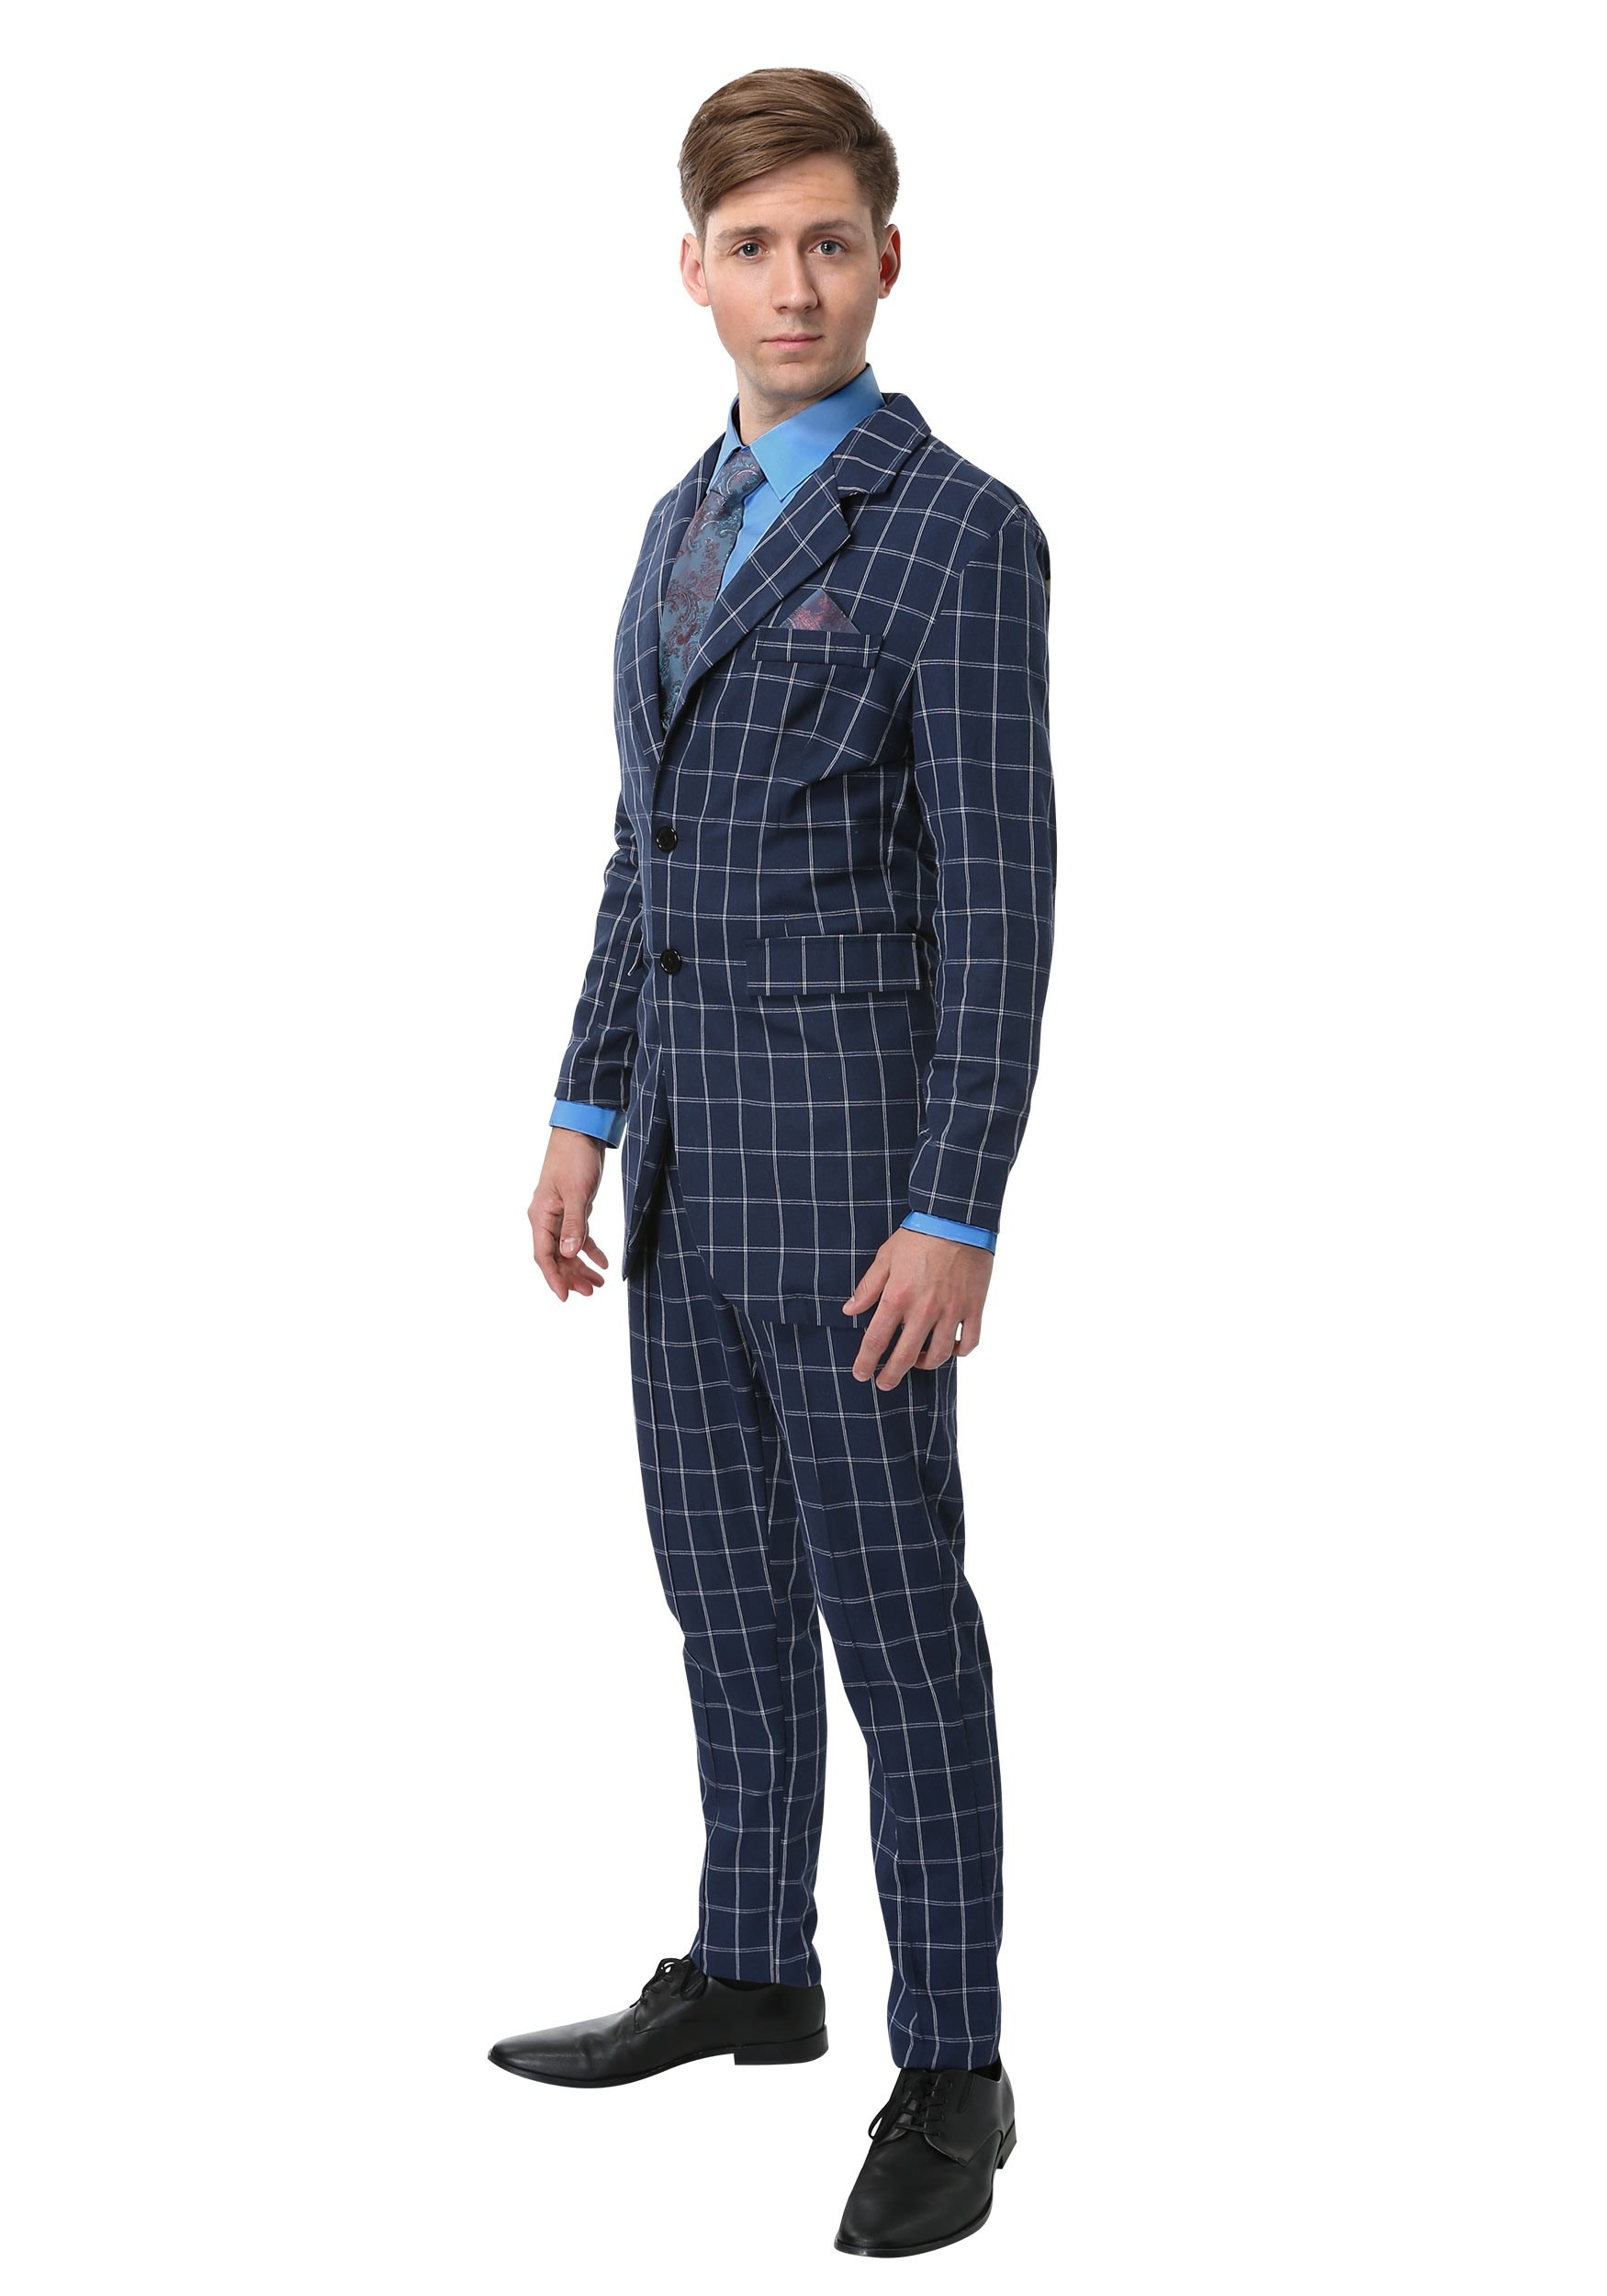 Hannibal Lecter Costume Suit for Men